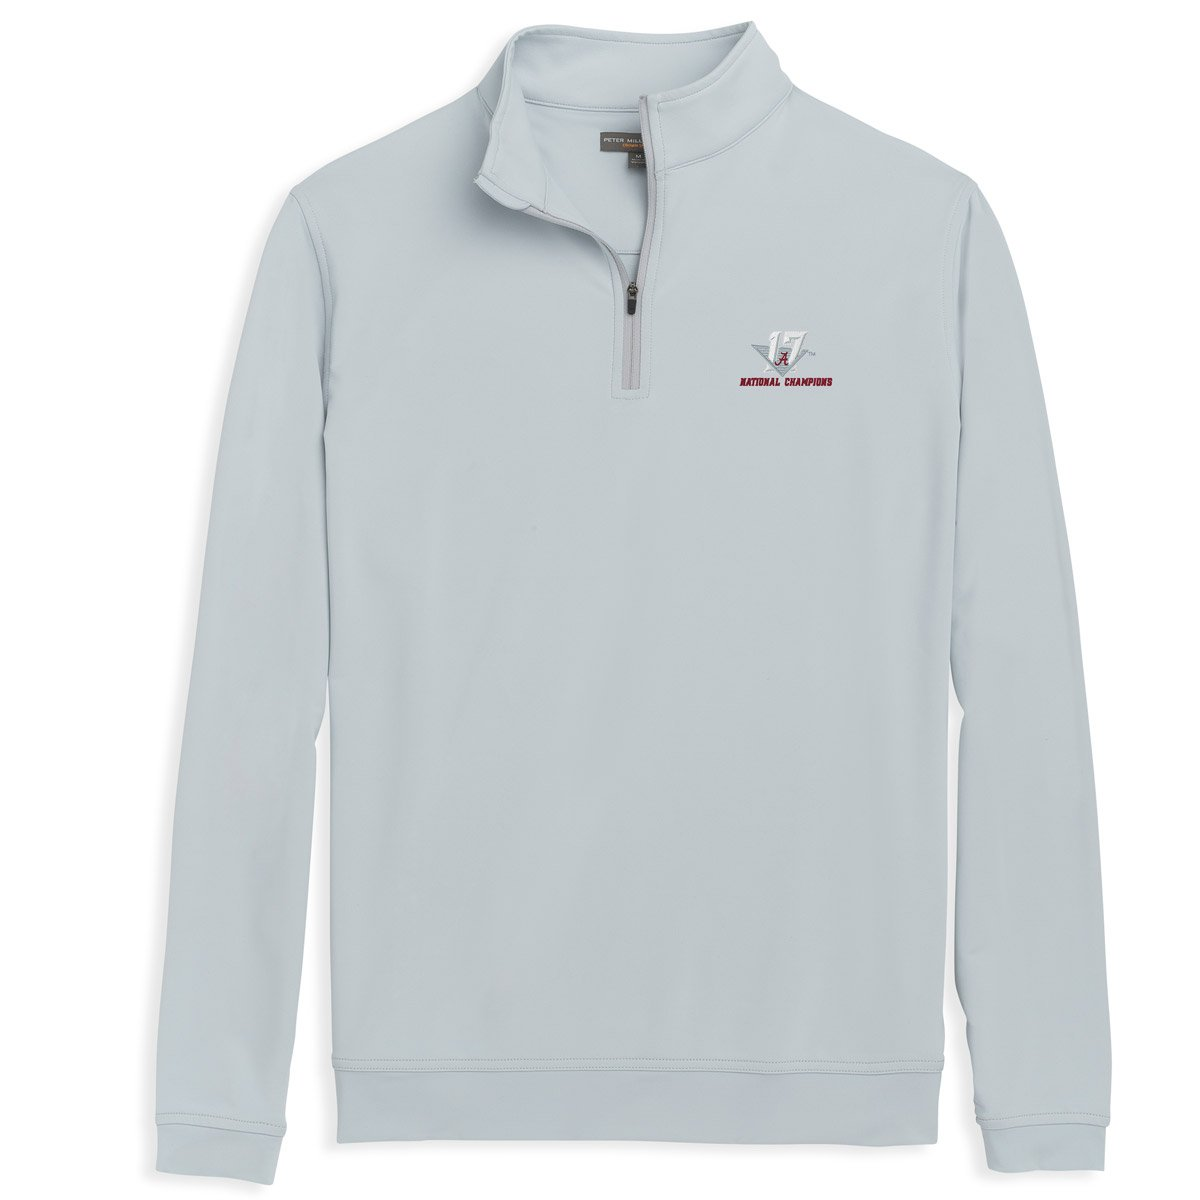 Business Polo Shirts With Logo Perth Rldm